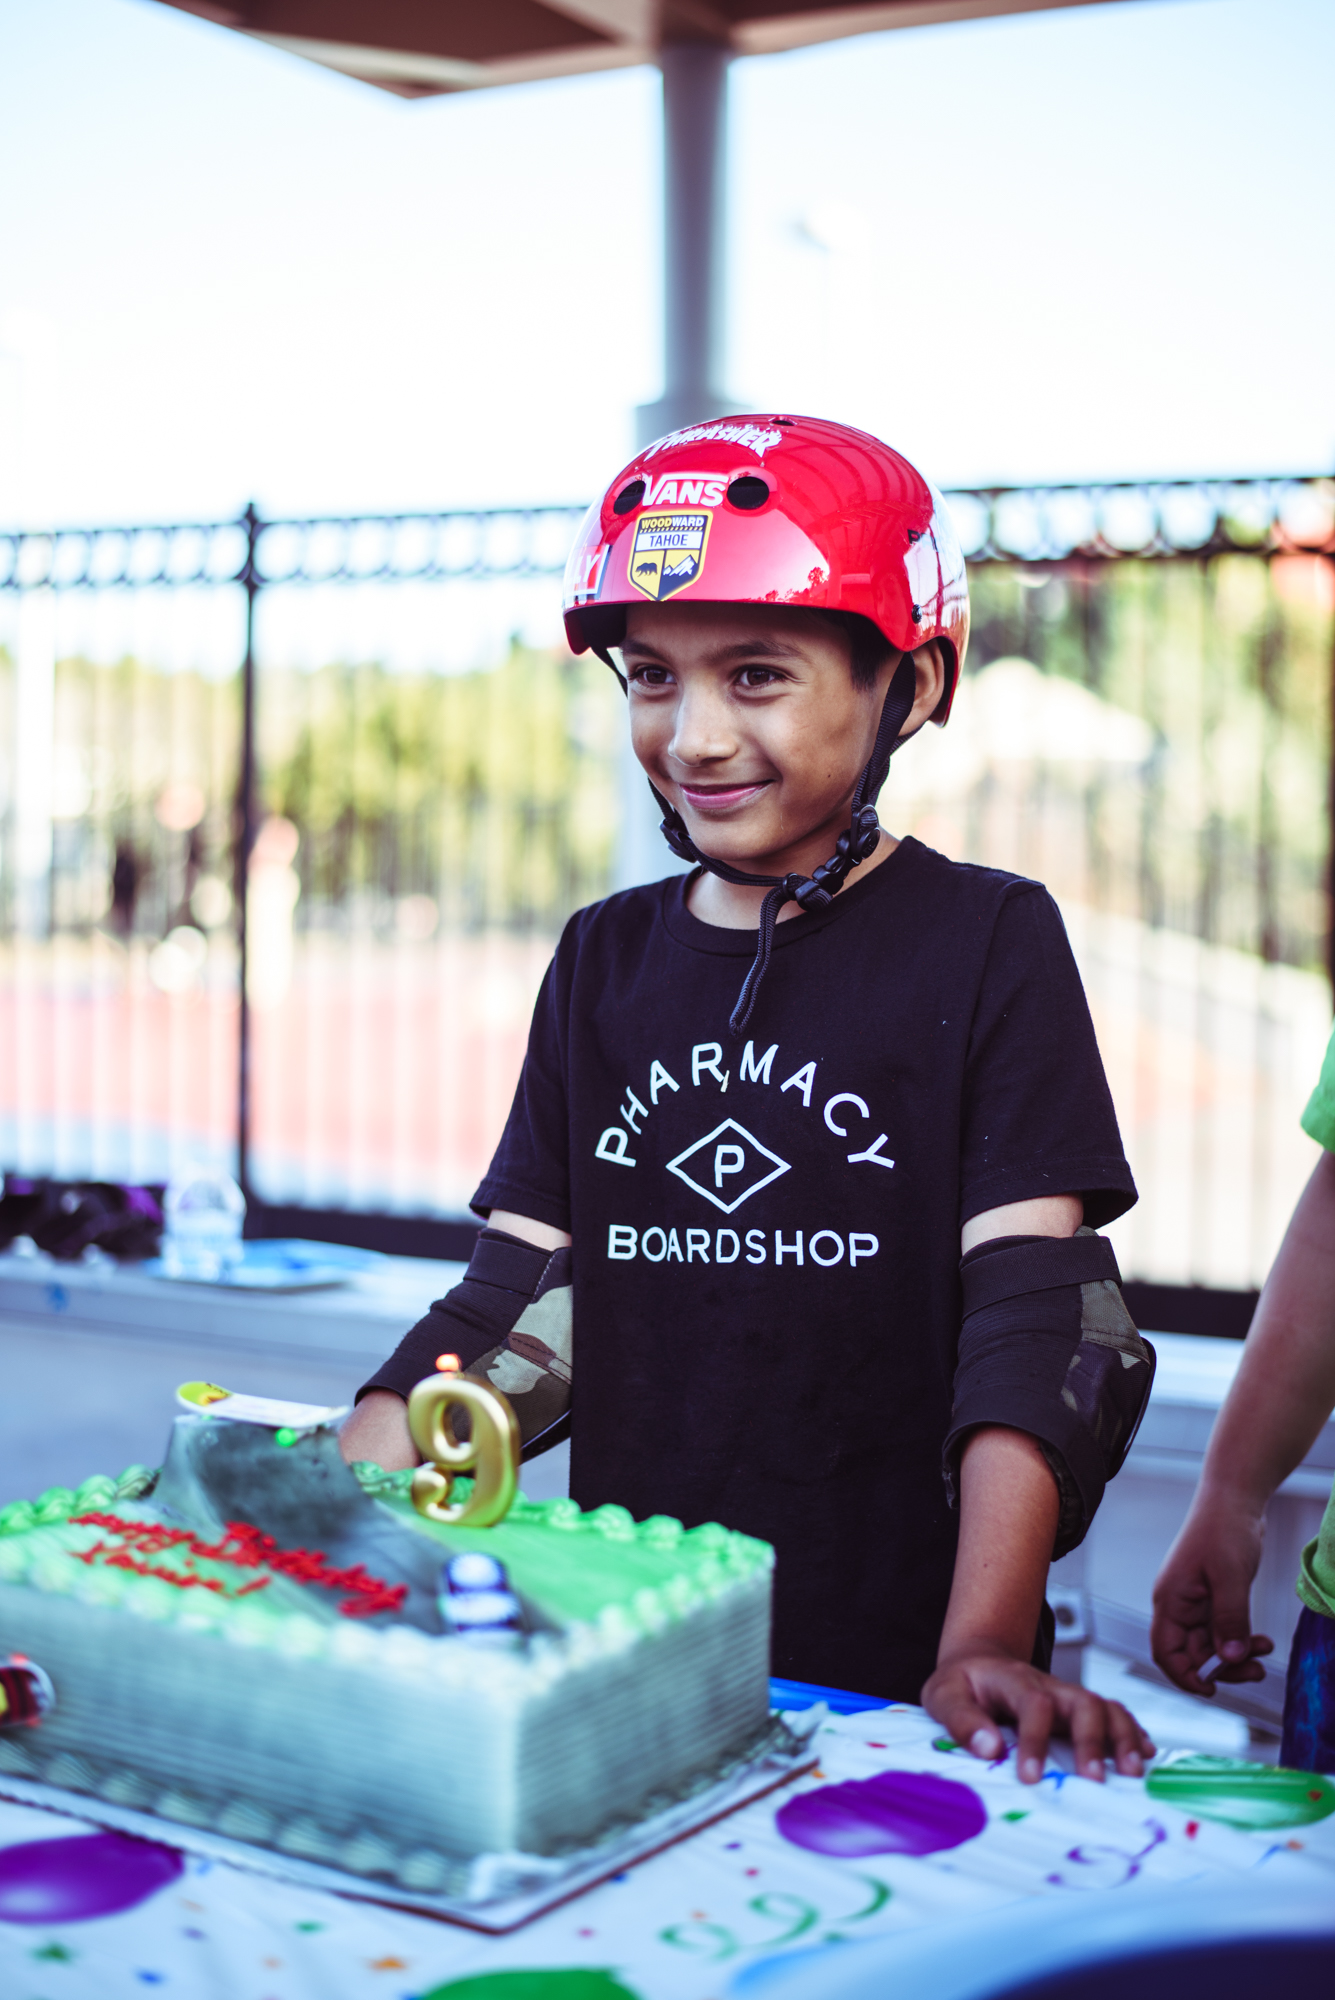 Skateboard Birthday Party-41.jpg